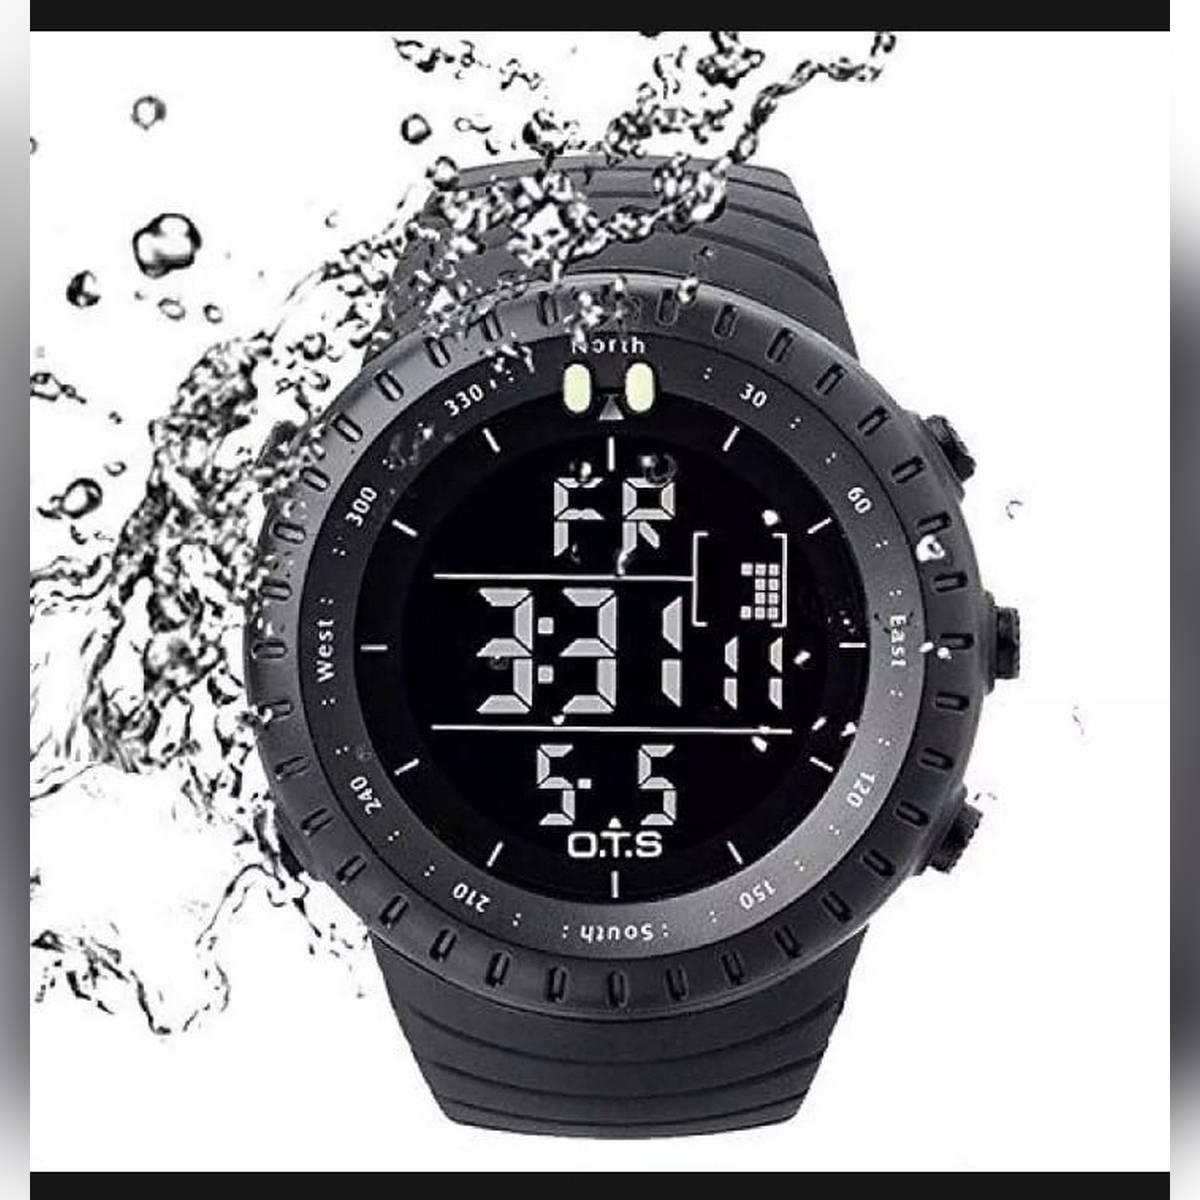 Men's Digital LED green light watch back steel SUUNTO army military casi0 boys watch